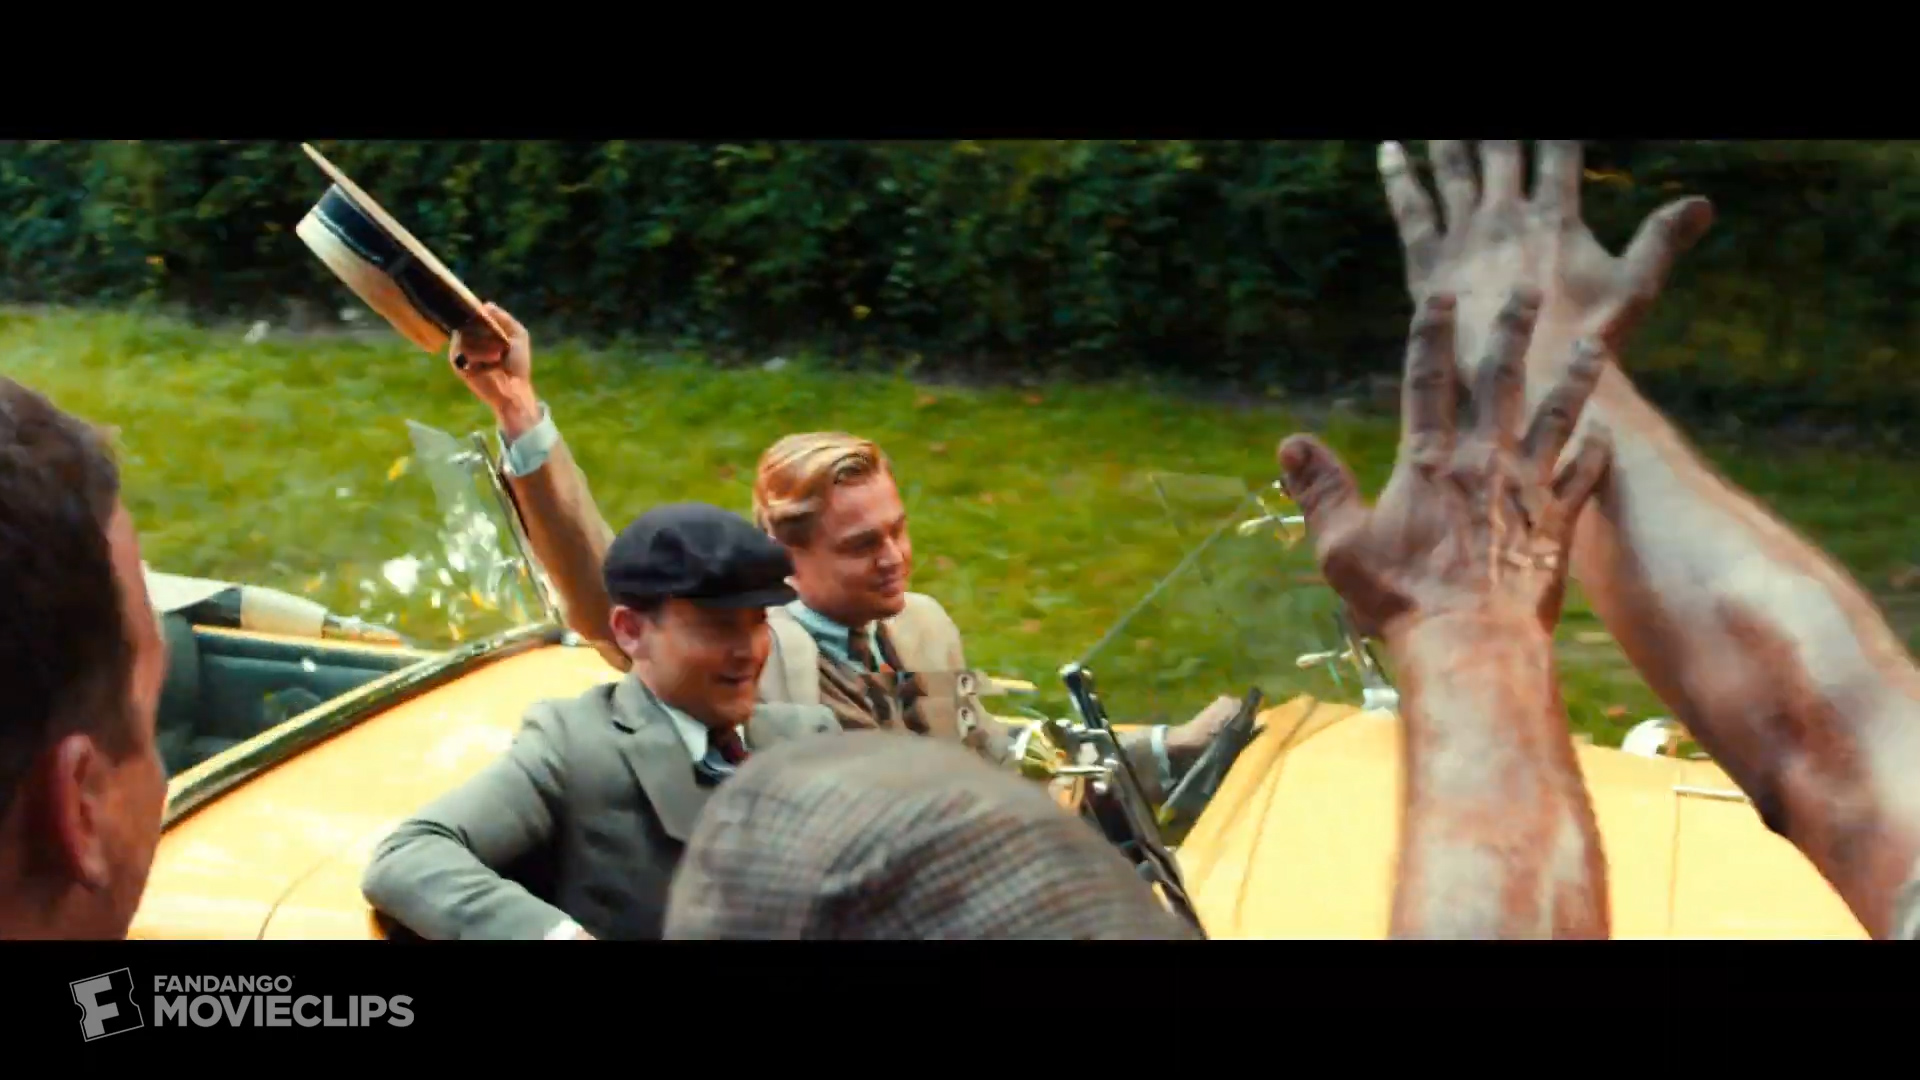 [1] The Great Gatsby - Gatsby's Wild Ride